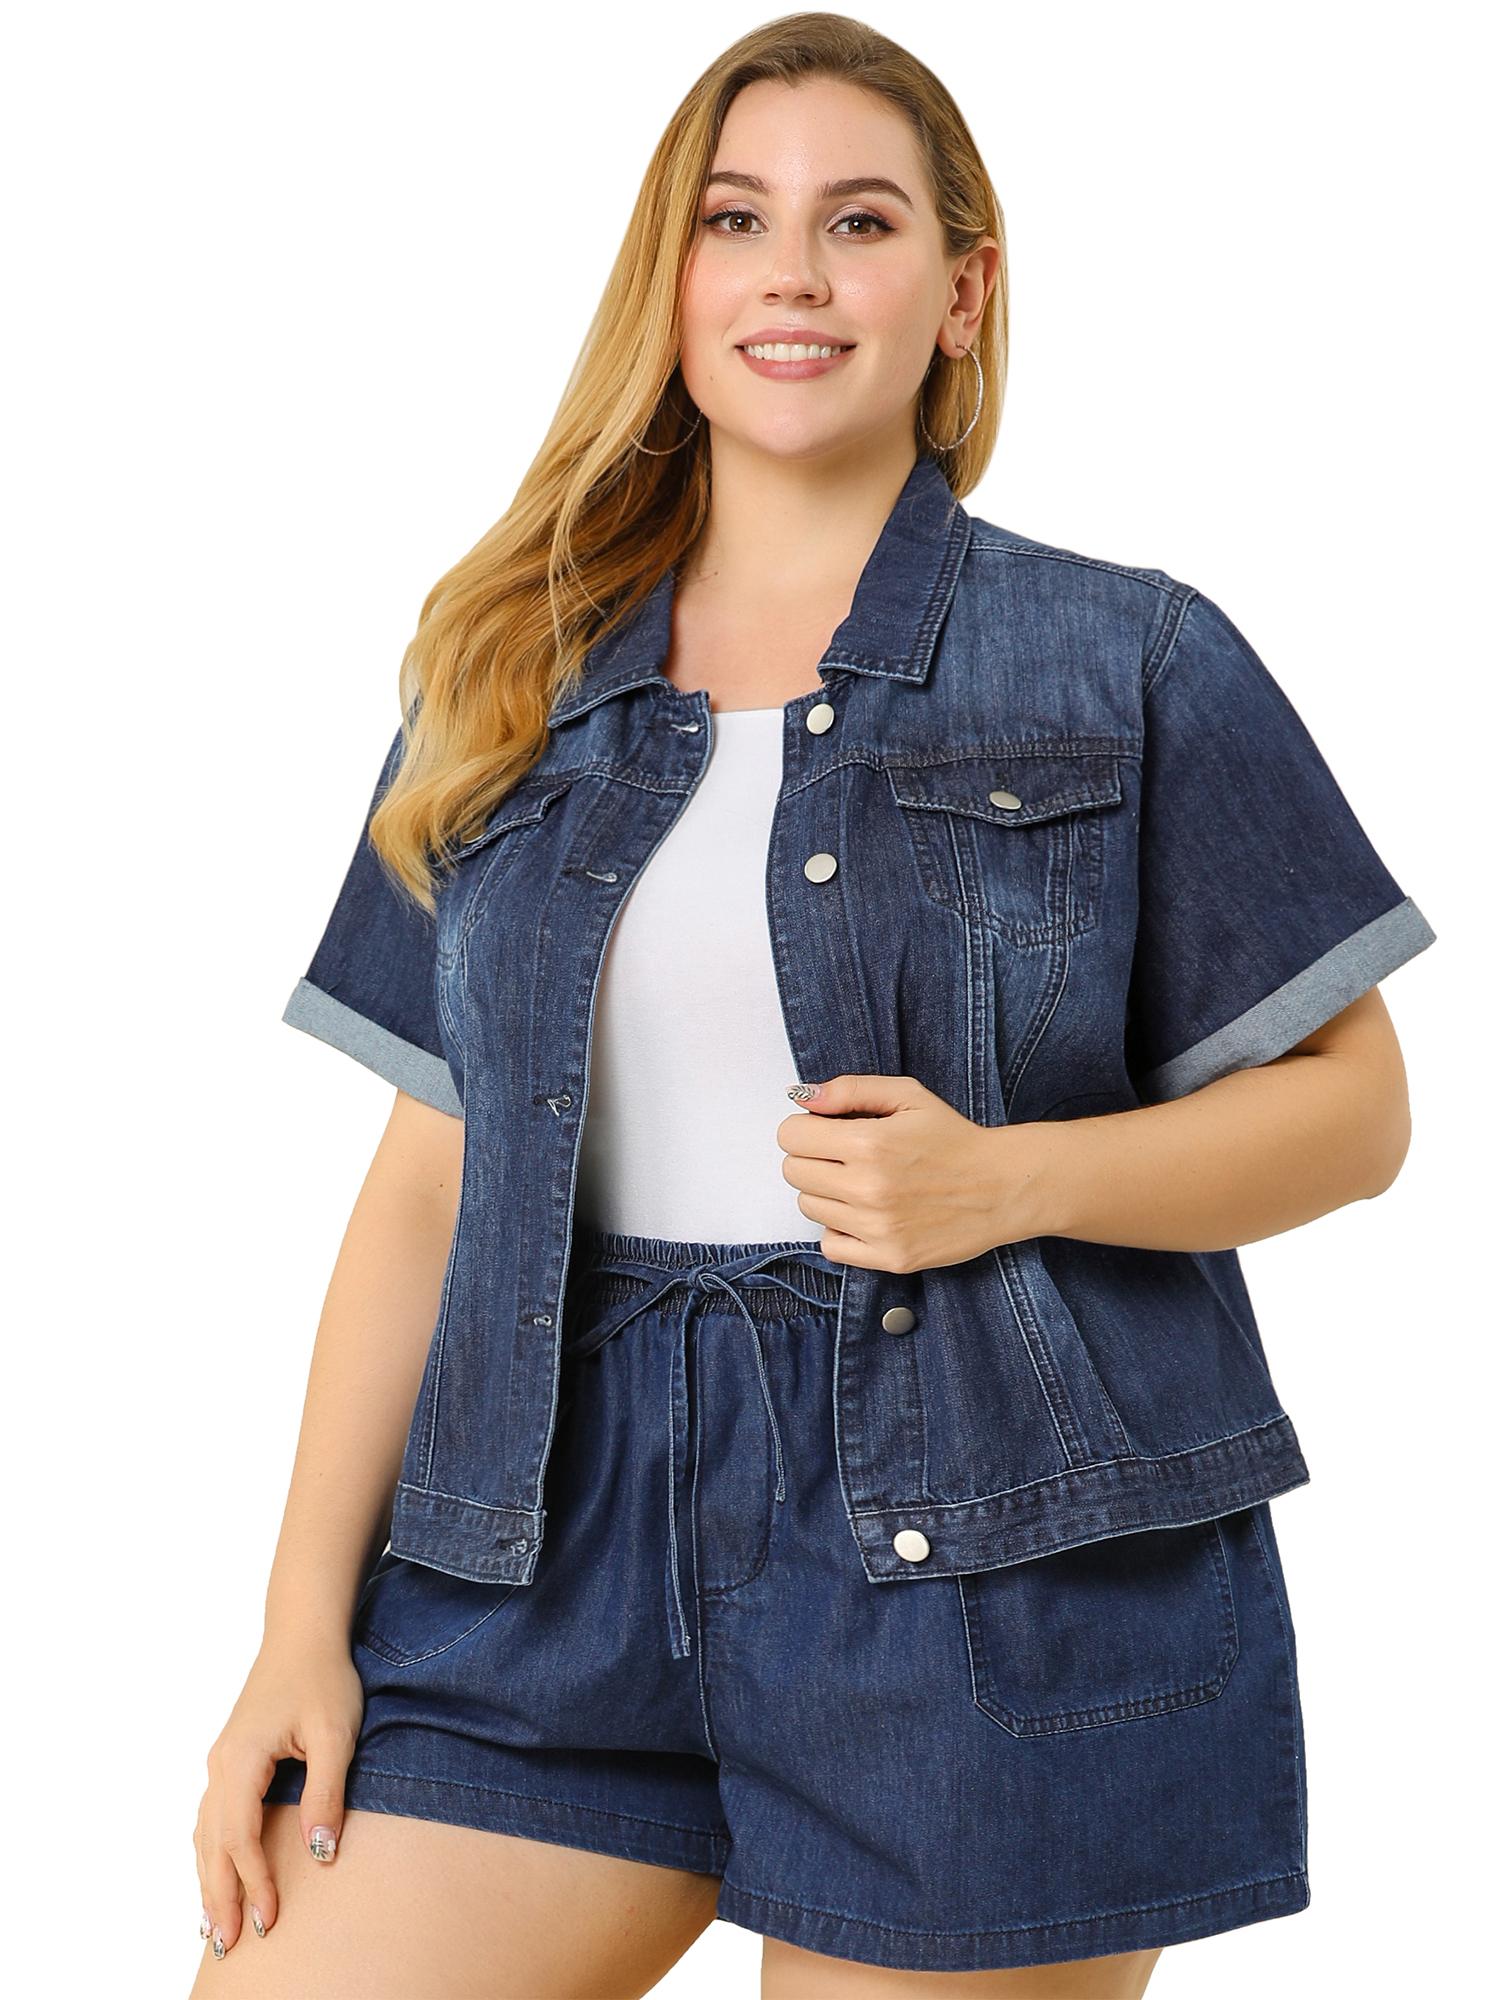 Women's Plus Size Denim Jacket Button Crop Short Sleeve Jackets Navy Blue 1X